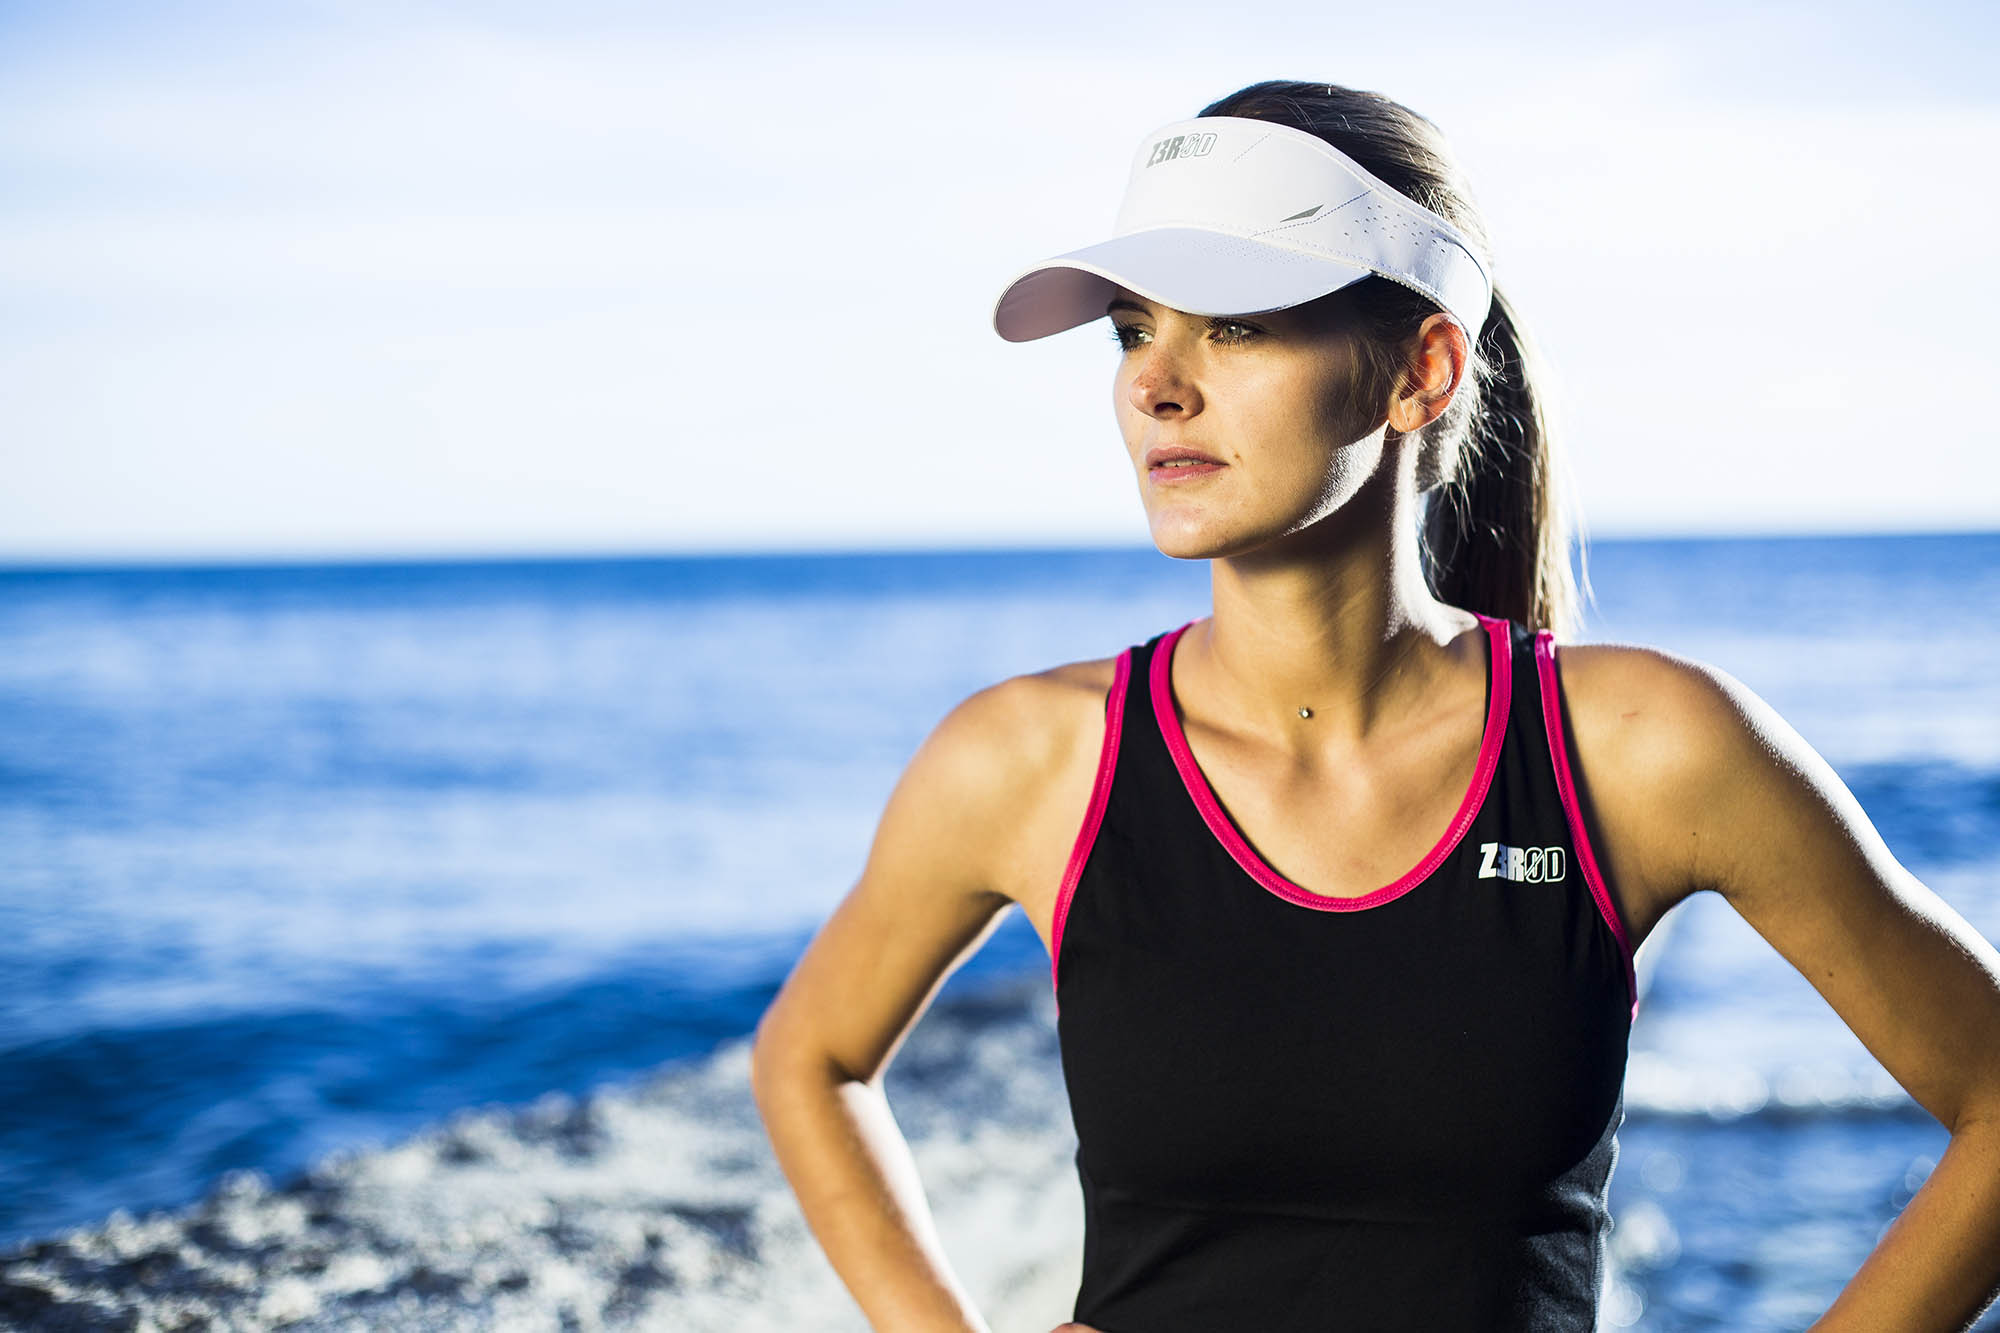 Accessories - Women - Caps & visors